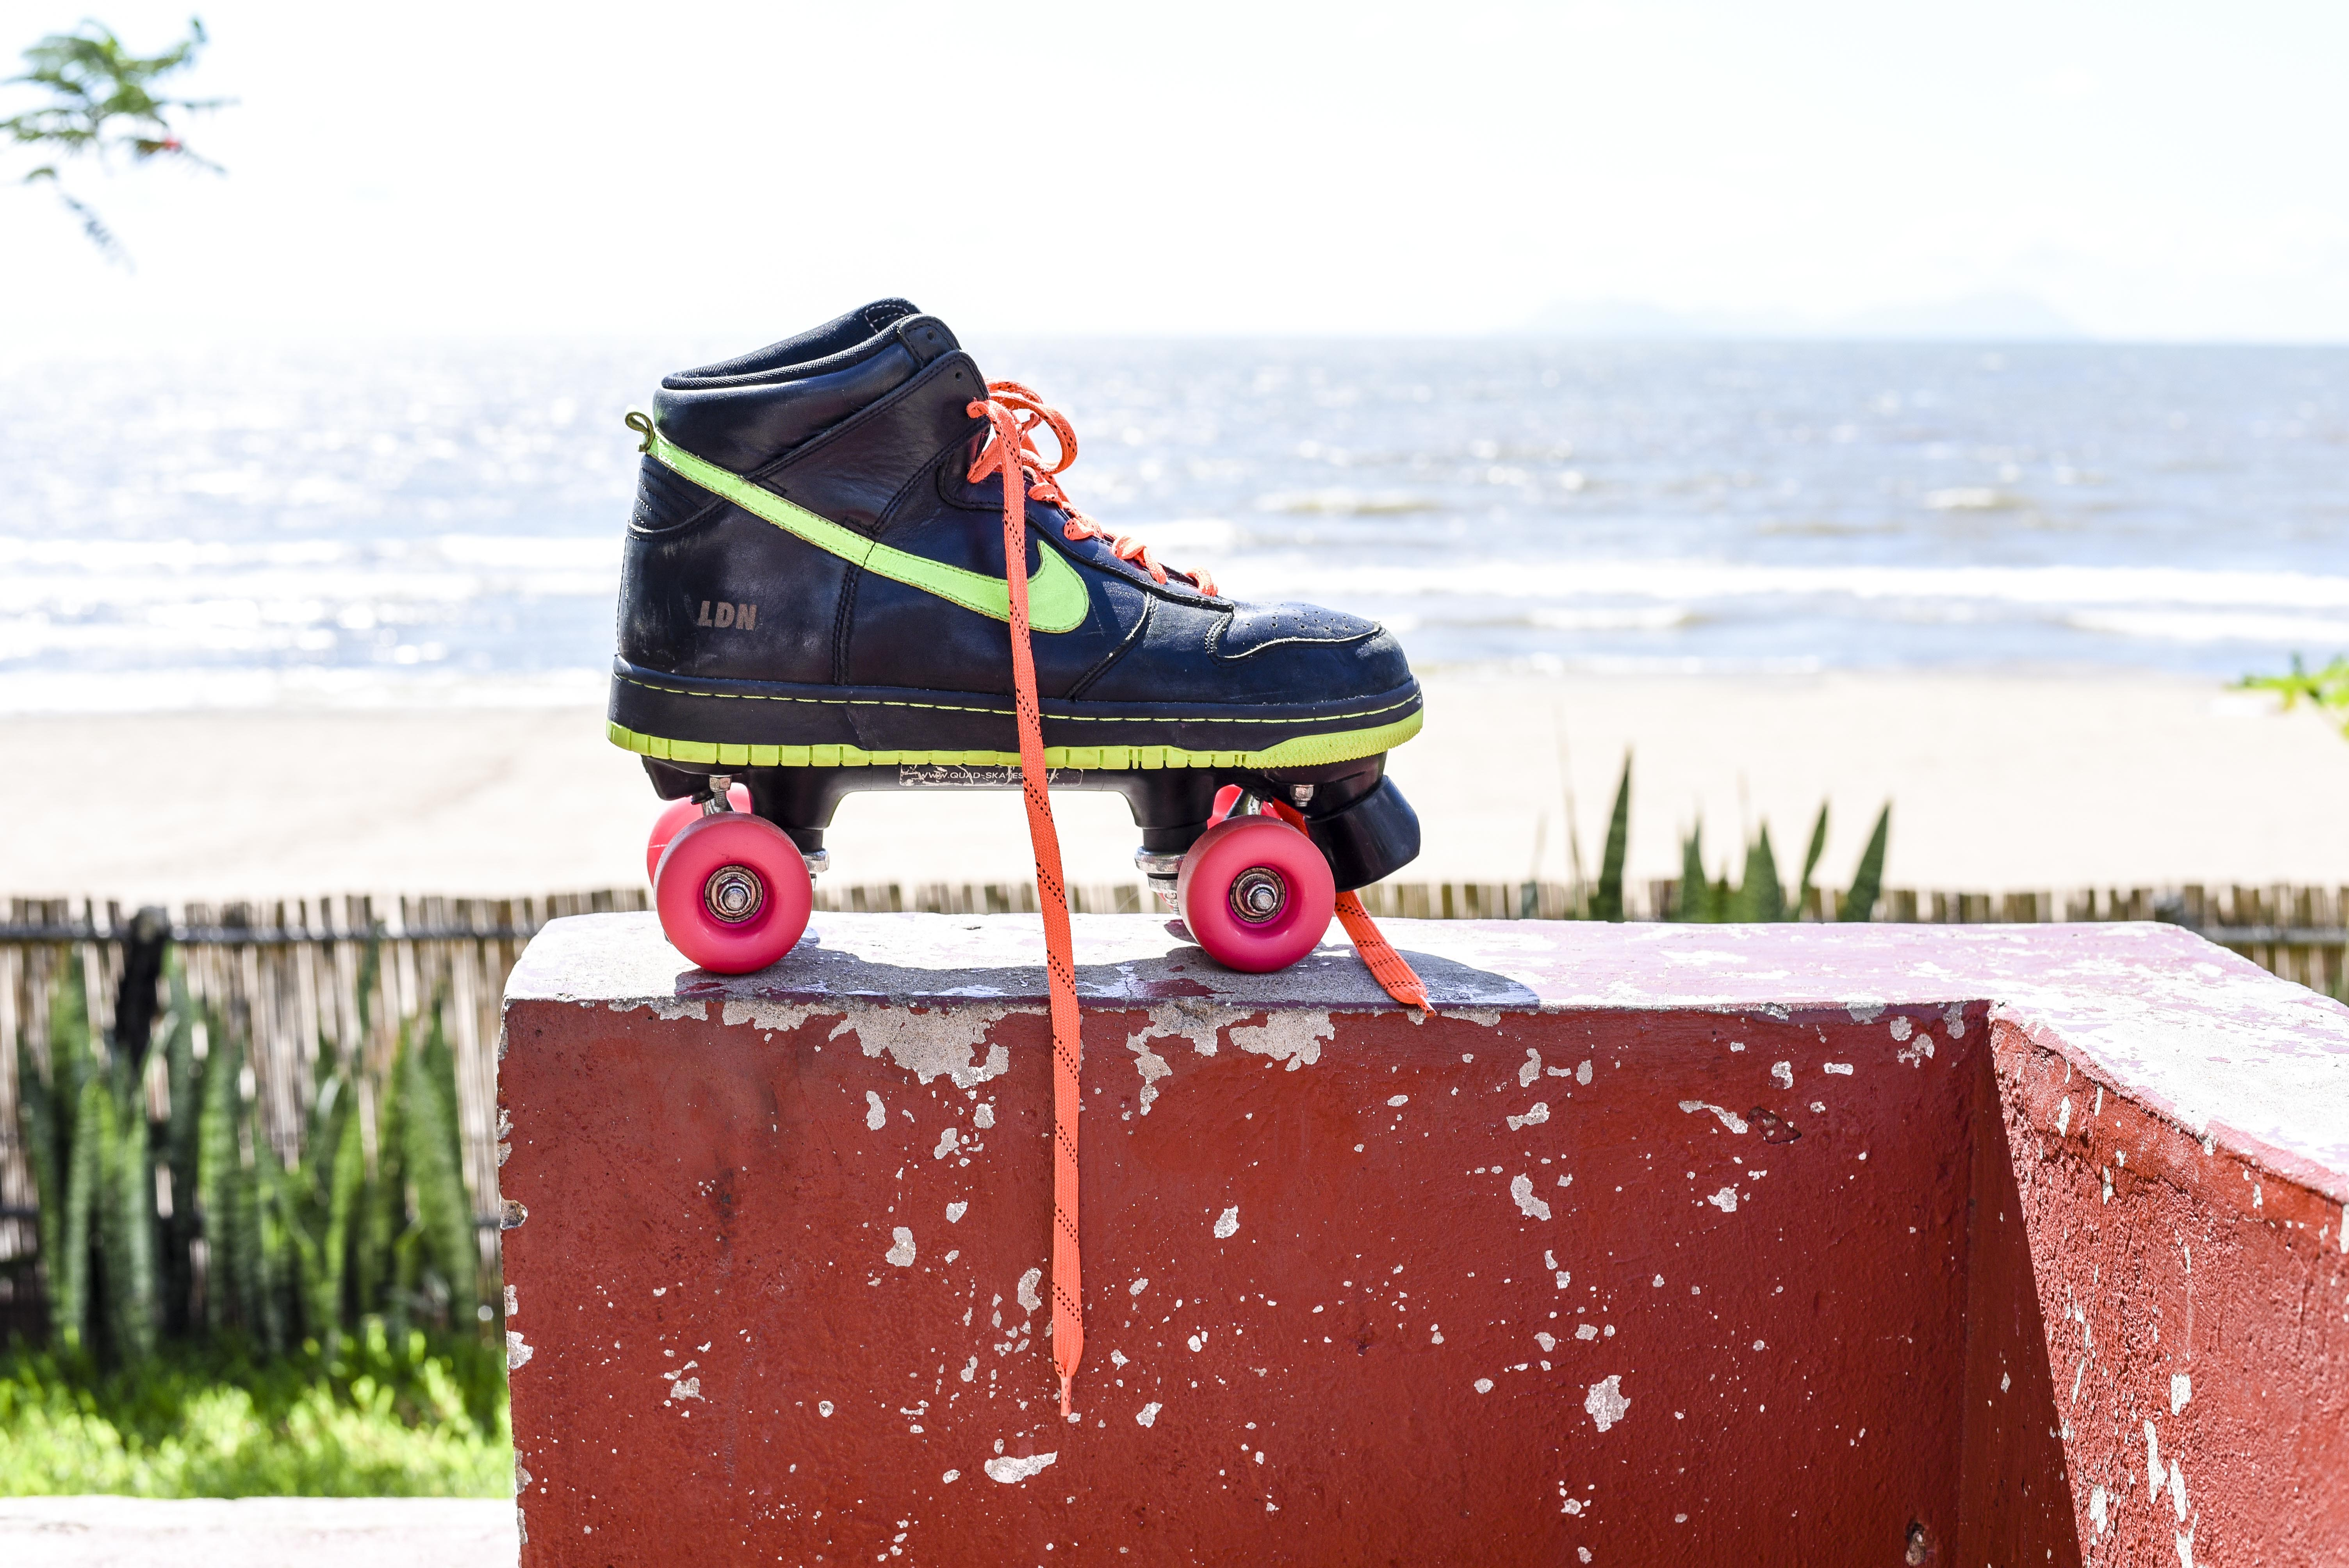 Skate by the lake.